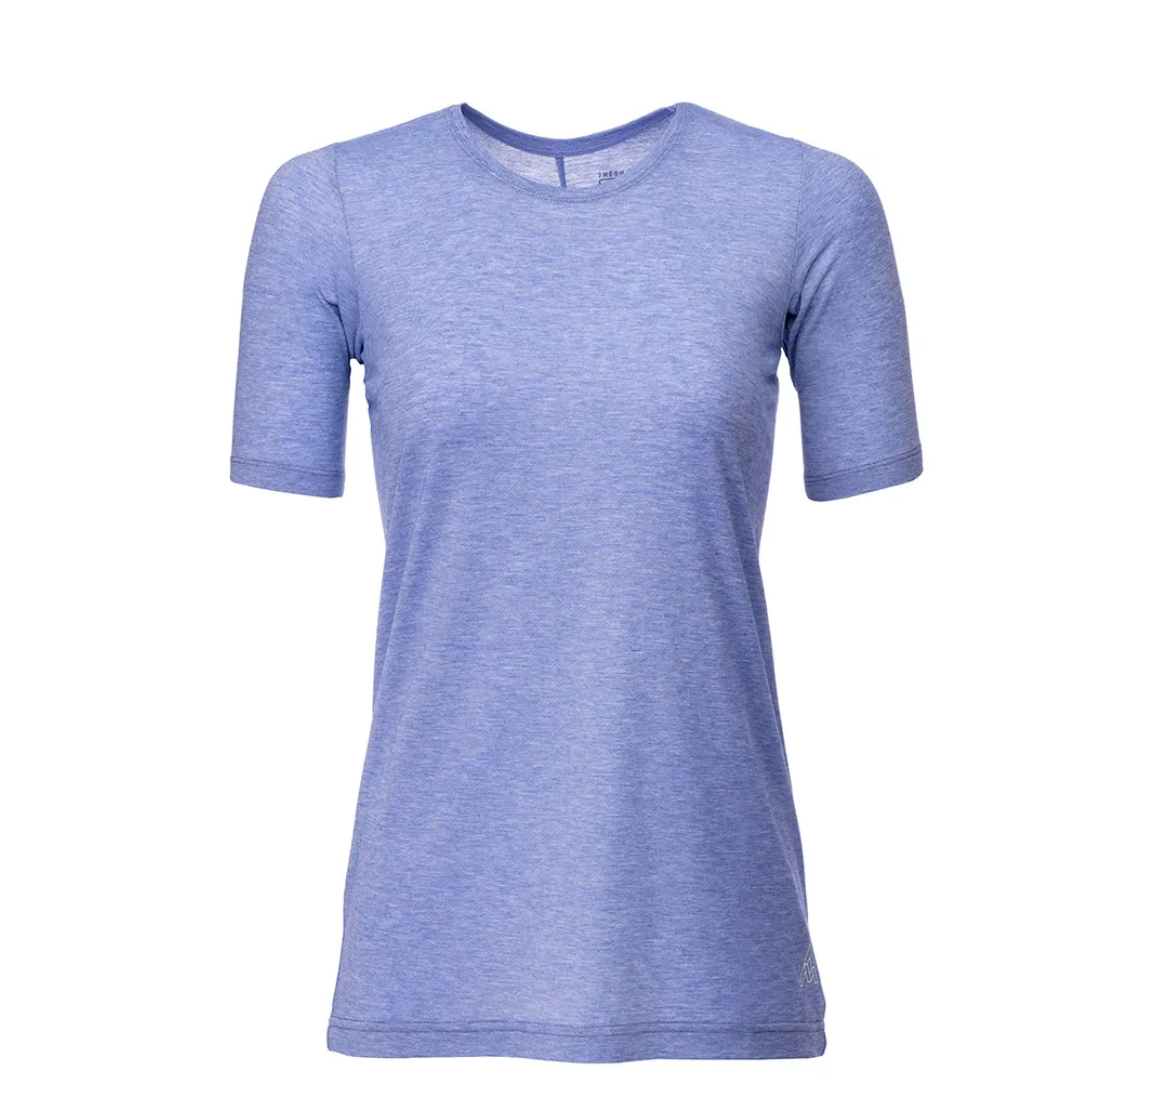 Women's Elevate T-Shirt Periwinkle-1